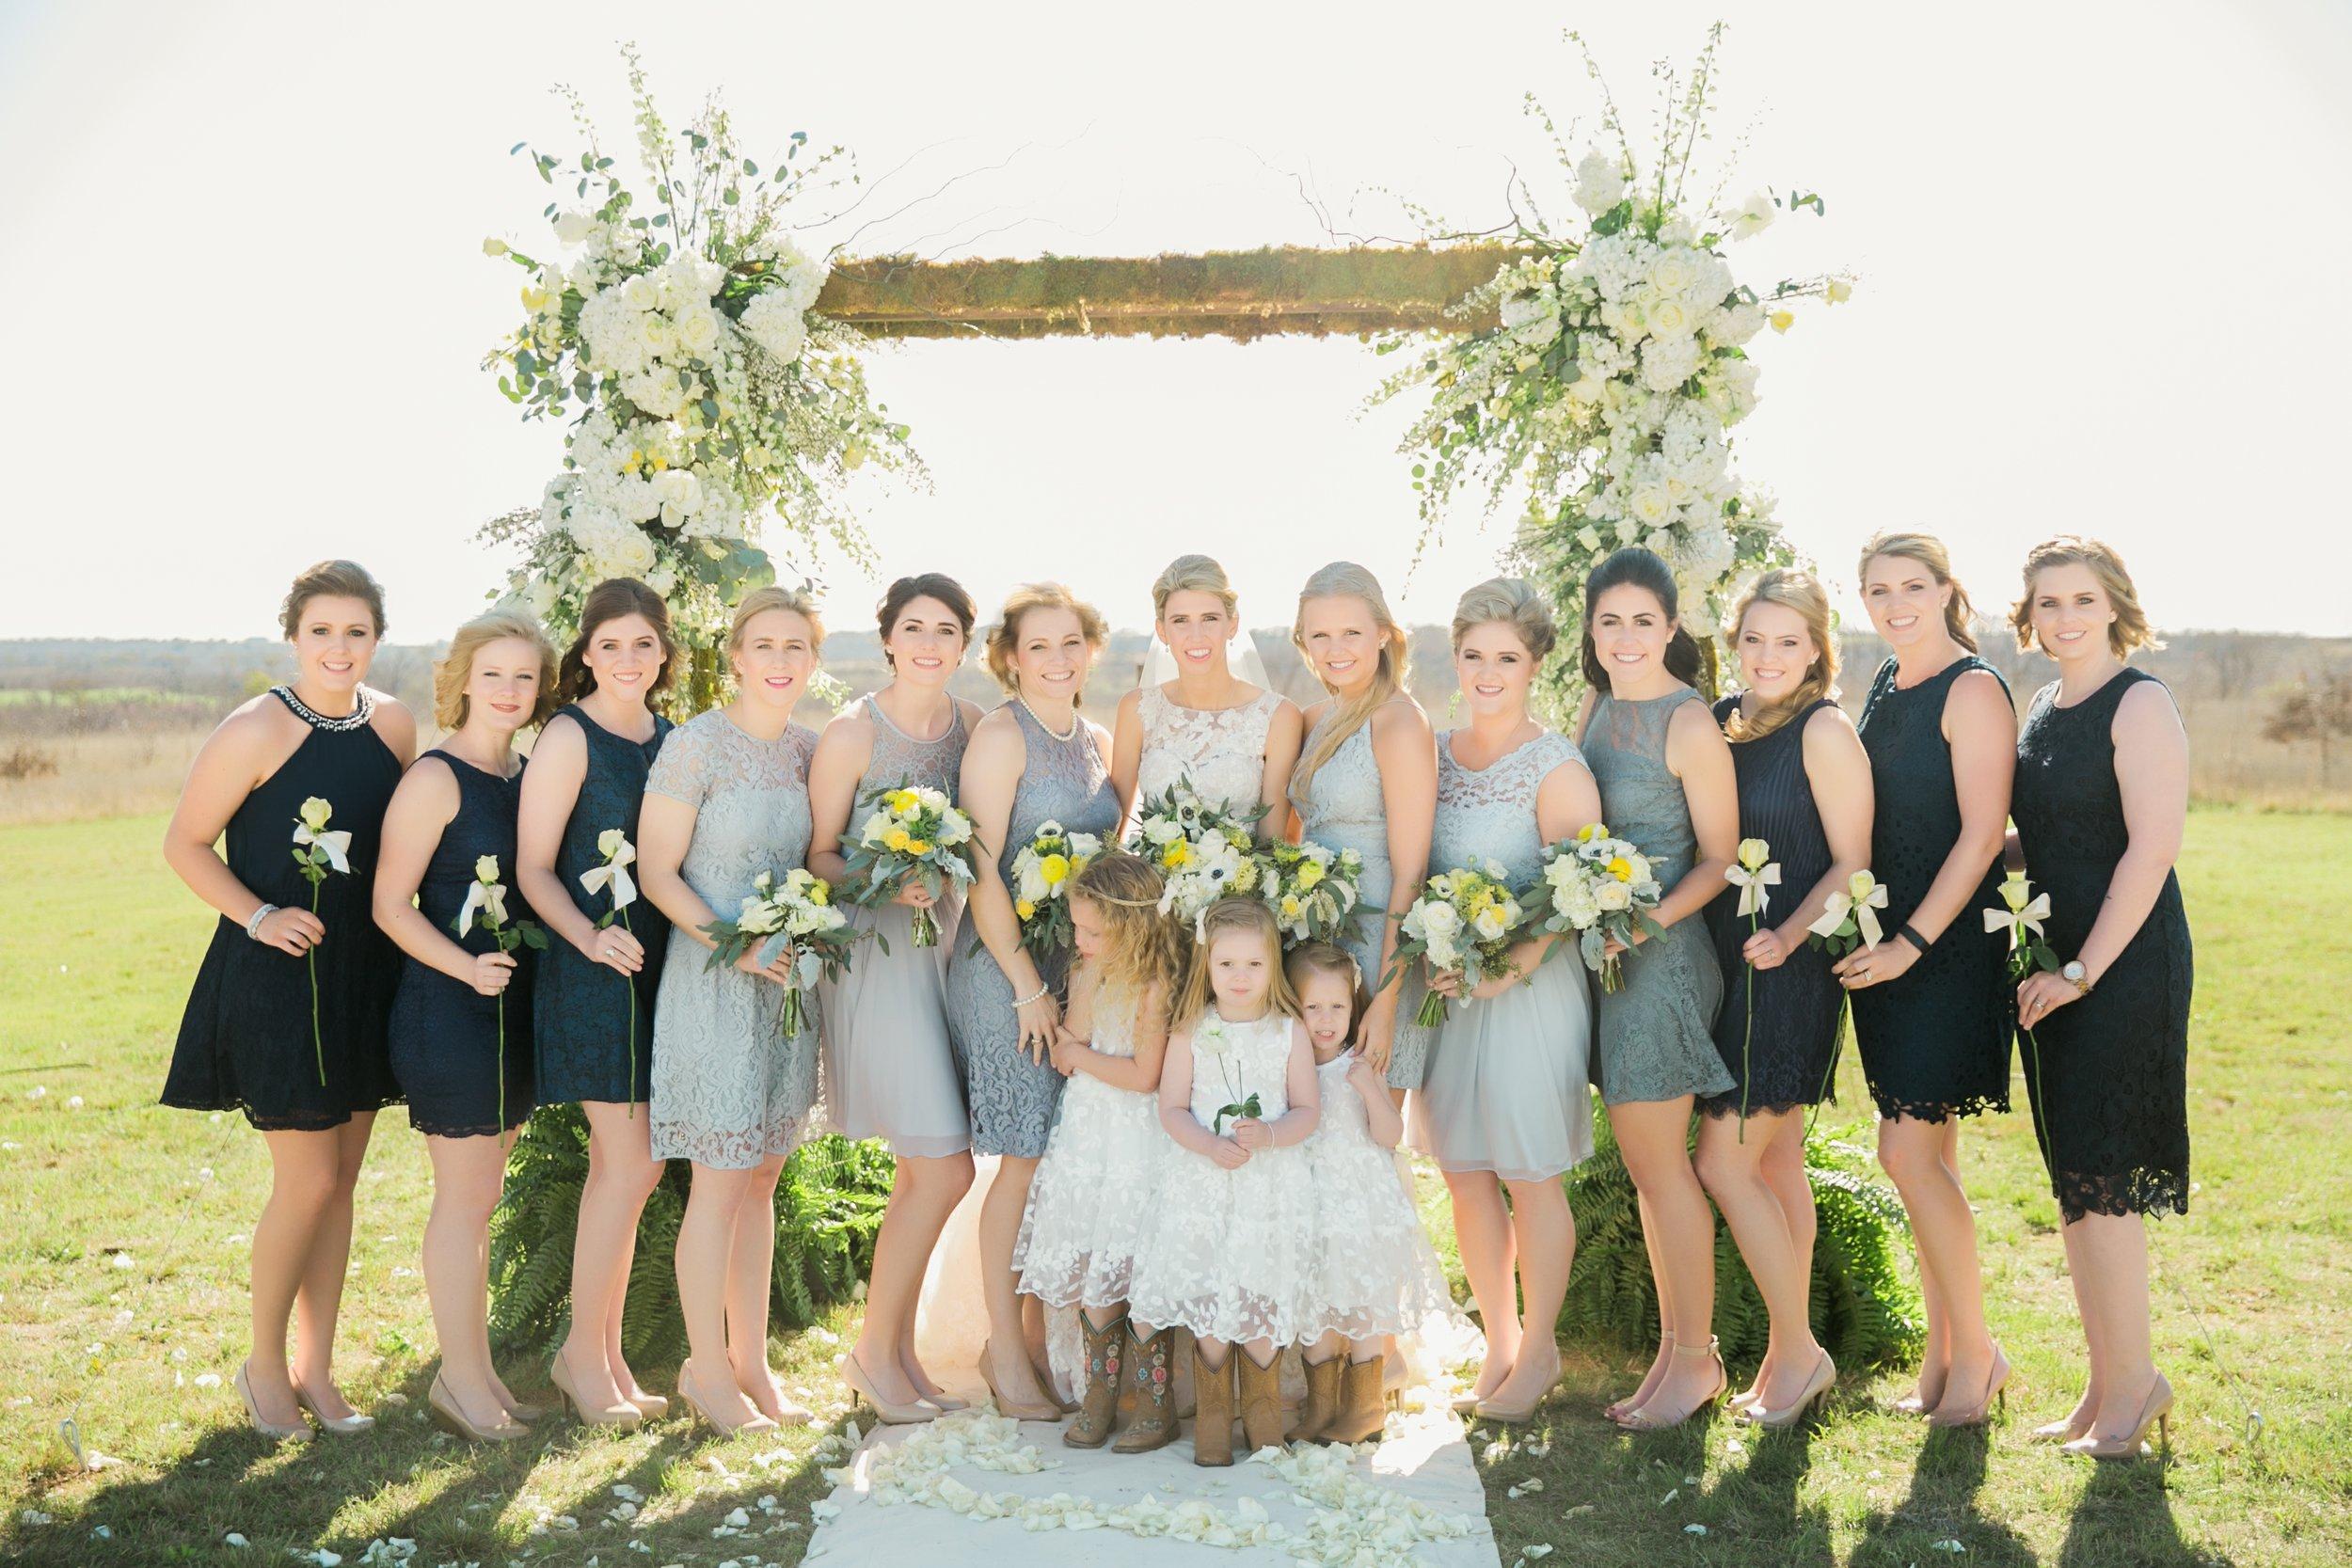 Hines-WeddingParty-0060.jpg